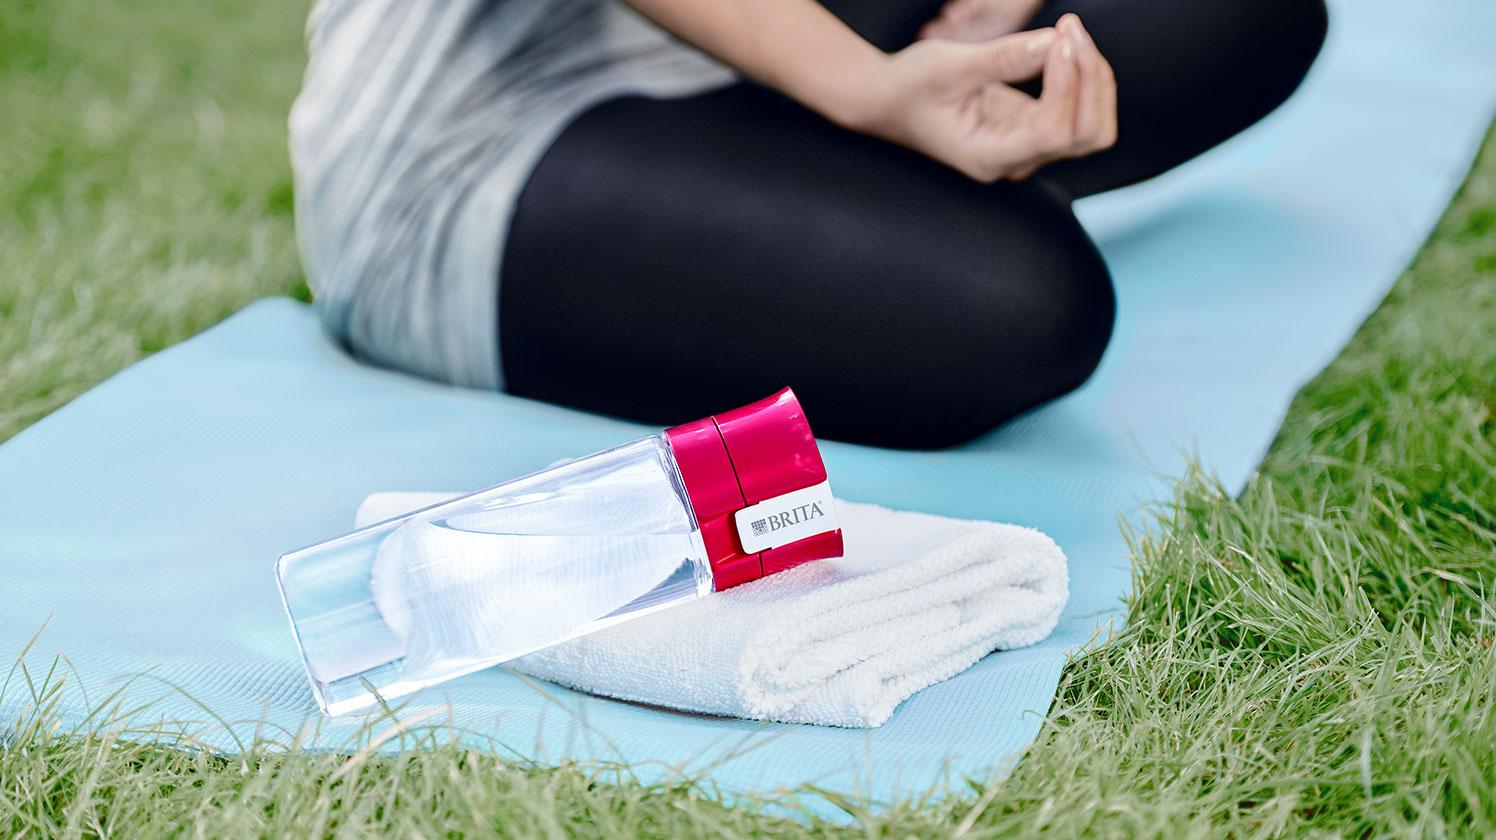 BRITA fill&go Vital pink: Park Frau Yoga